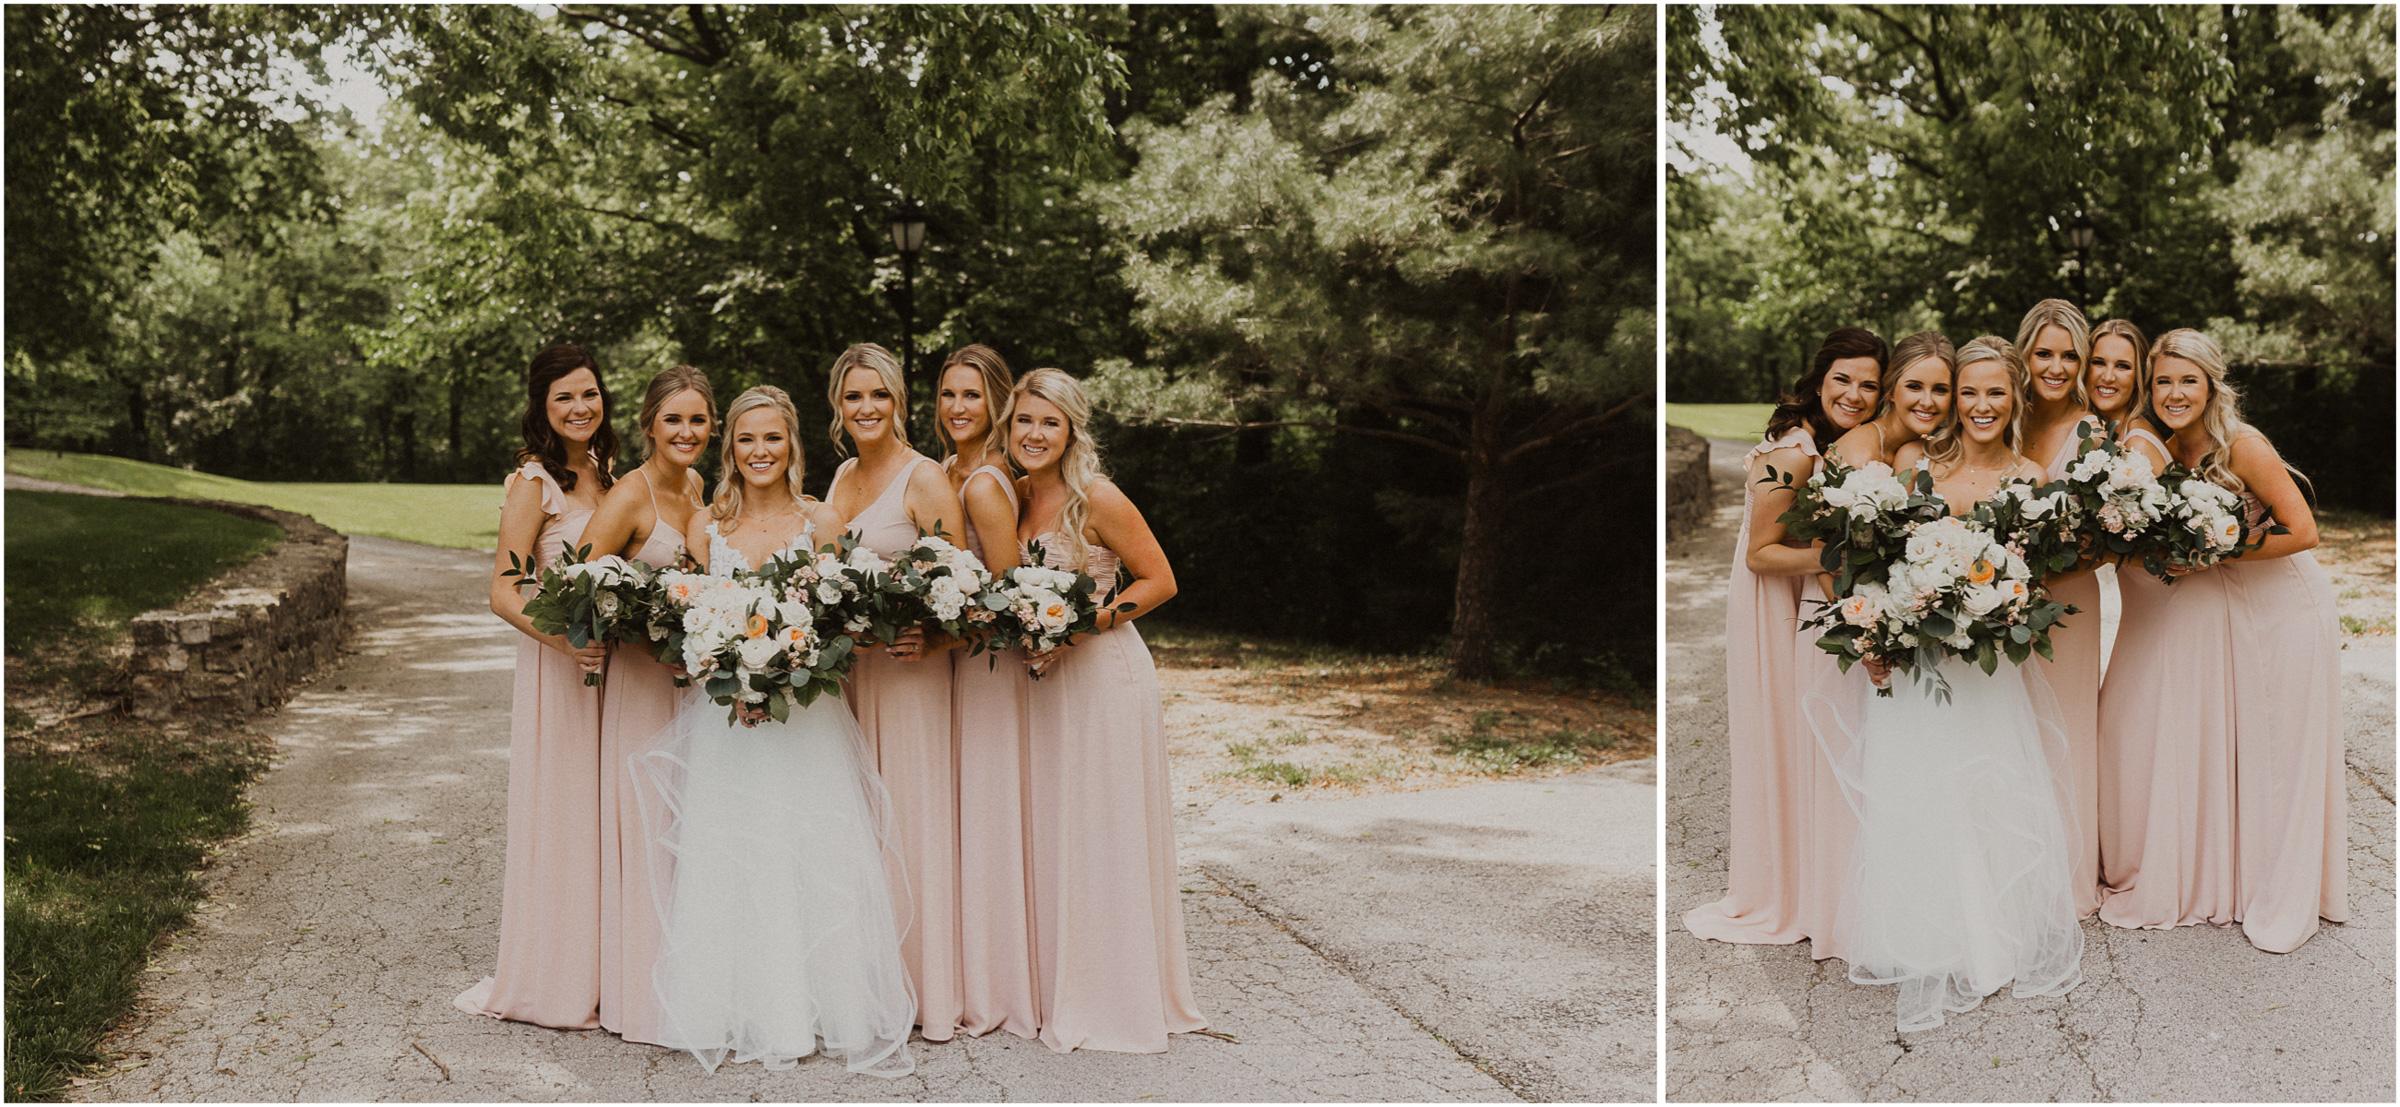 alyssa barletter photography hawthorne house summer outdoor wedding southern charm inspiration-28.jpg